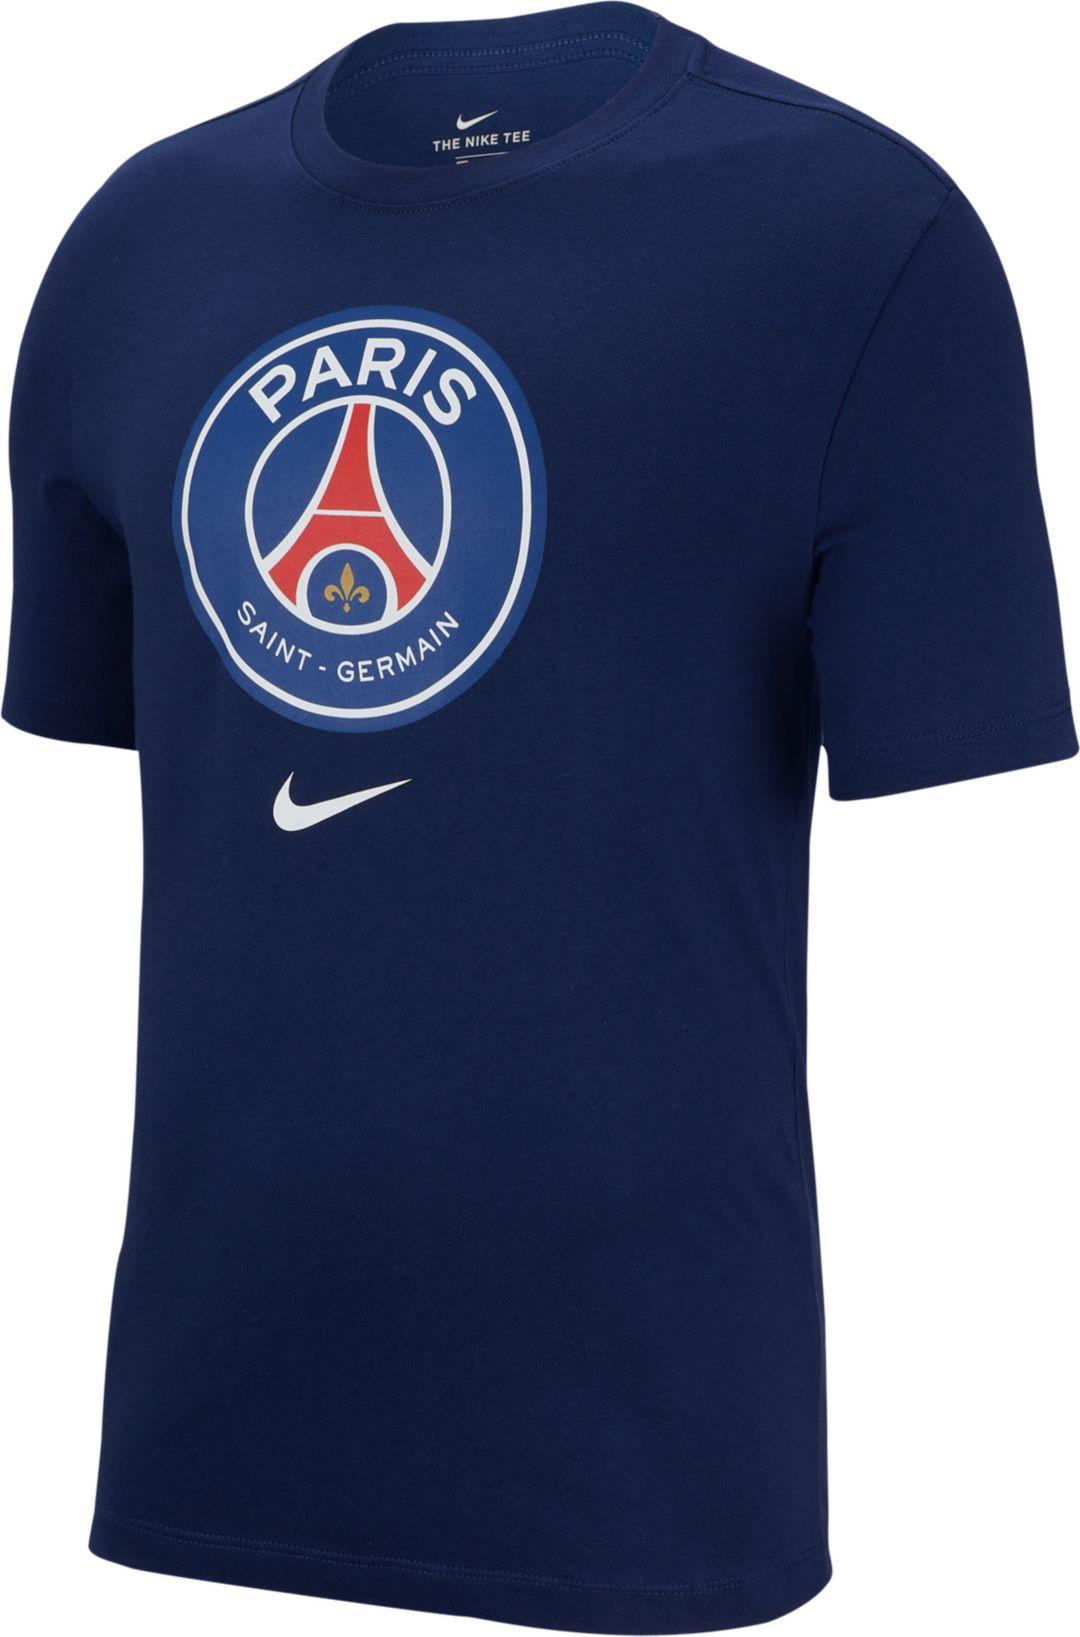 pretty nice 2649a 2487a Nike Men's Paris Saint-Germain Crest Navy T-Shirt